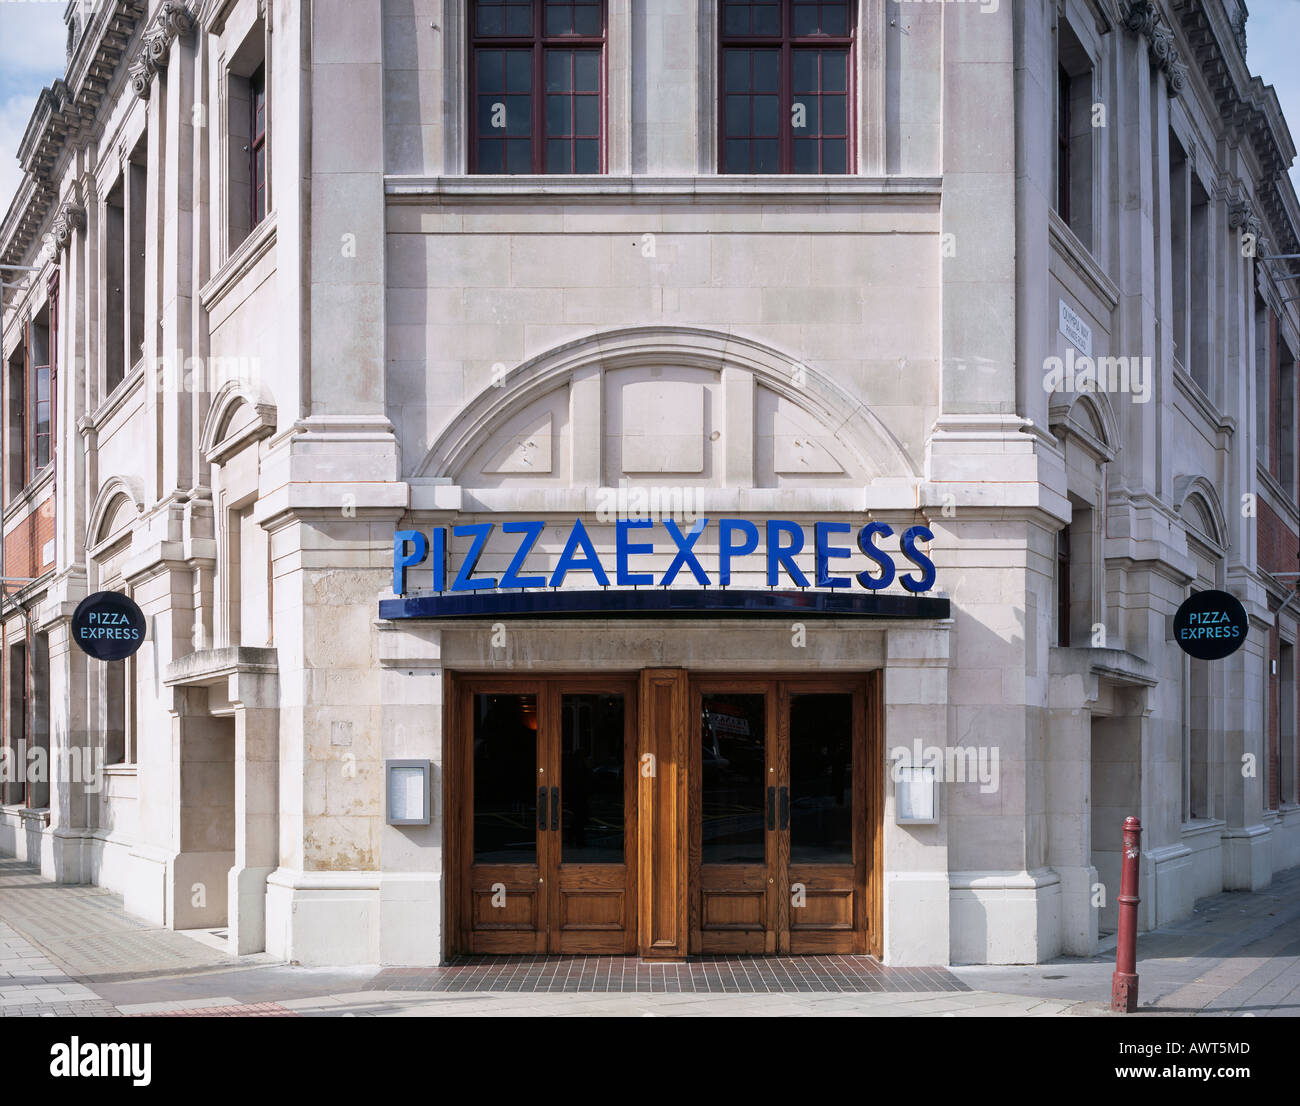 Pizza Express London Uk Stock Photo 9512972 Alamy